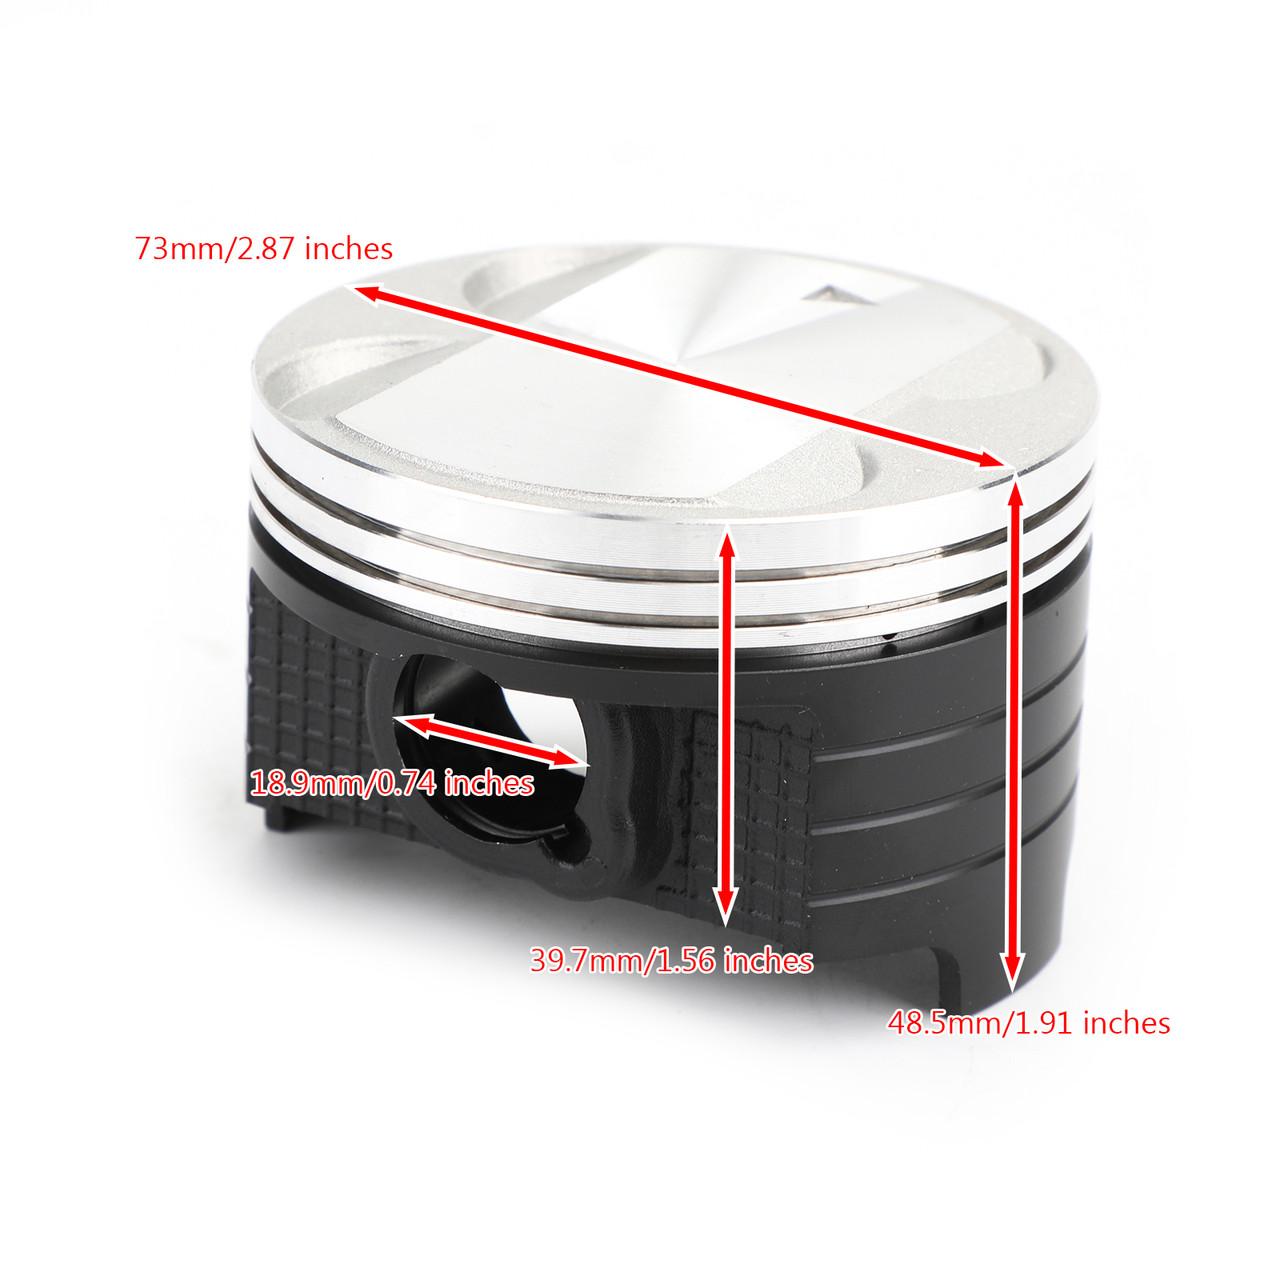 Piston Rings Pin Clips Kit STD 73mm Bore for Suzuki DR250 90-91 DR250R 98-00 DR250S 90-94 DR250SE 95 DRZ250 01-07 AN250 Burgman 250 98-06